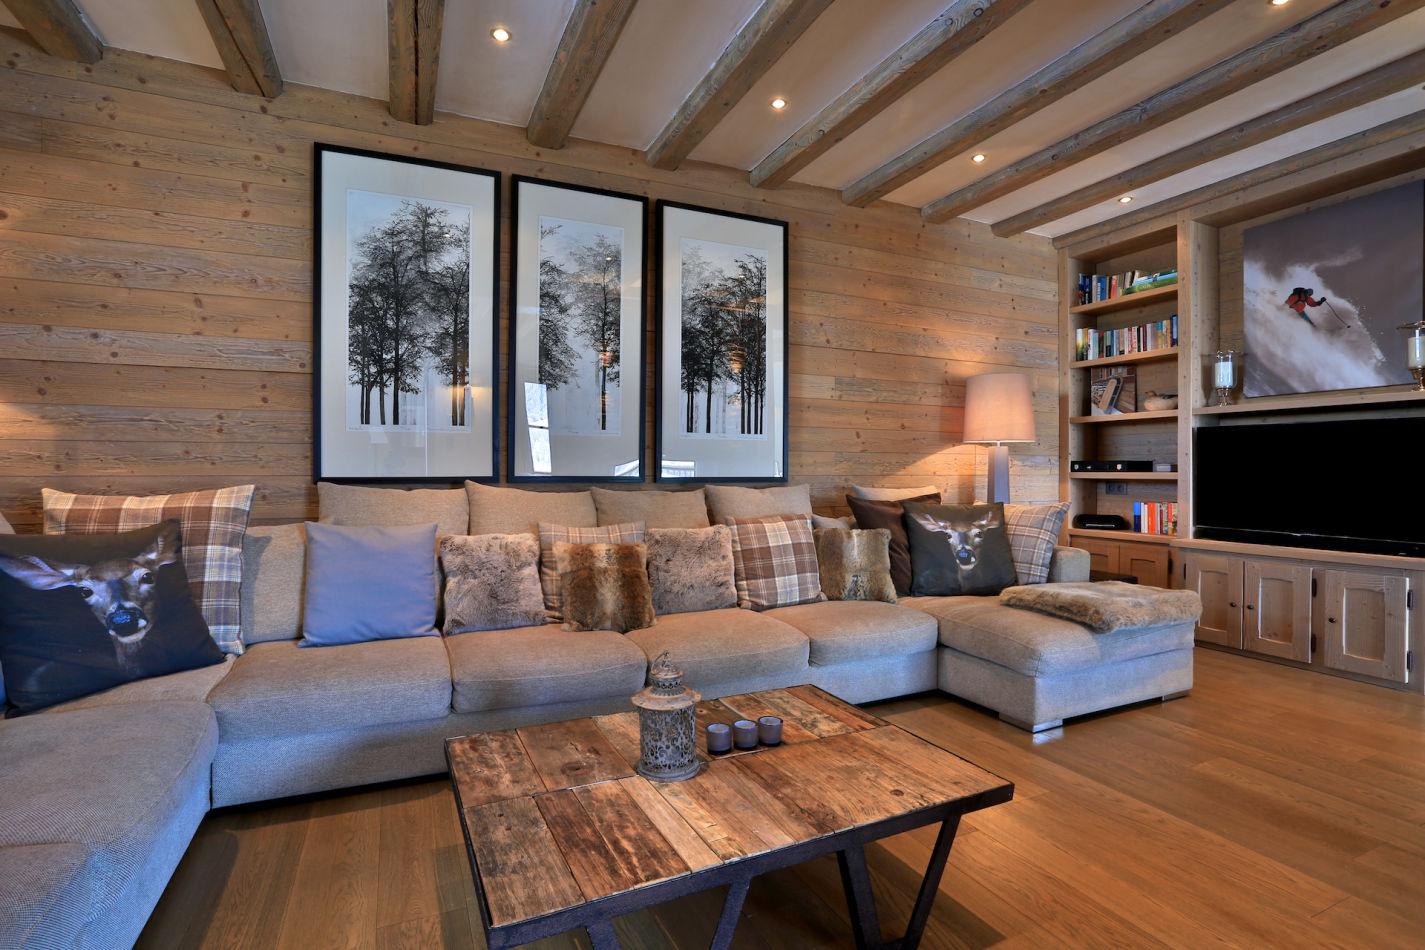 living-room-daytime-1-image-19